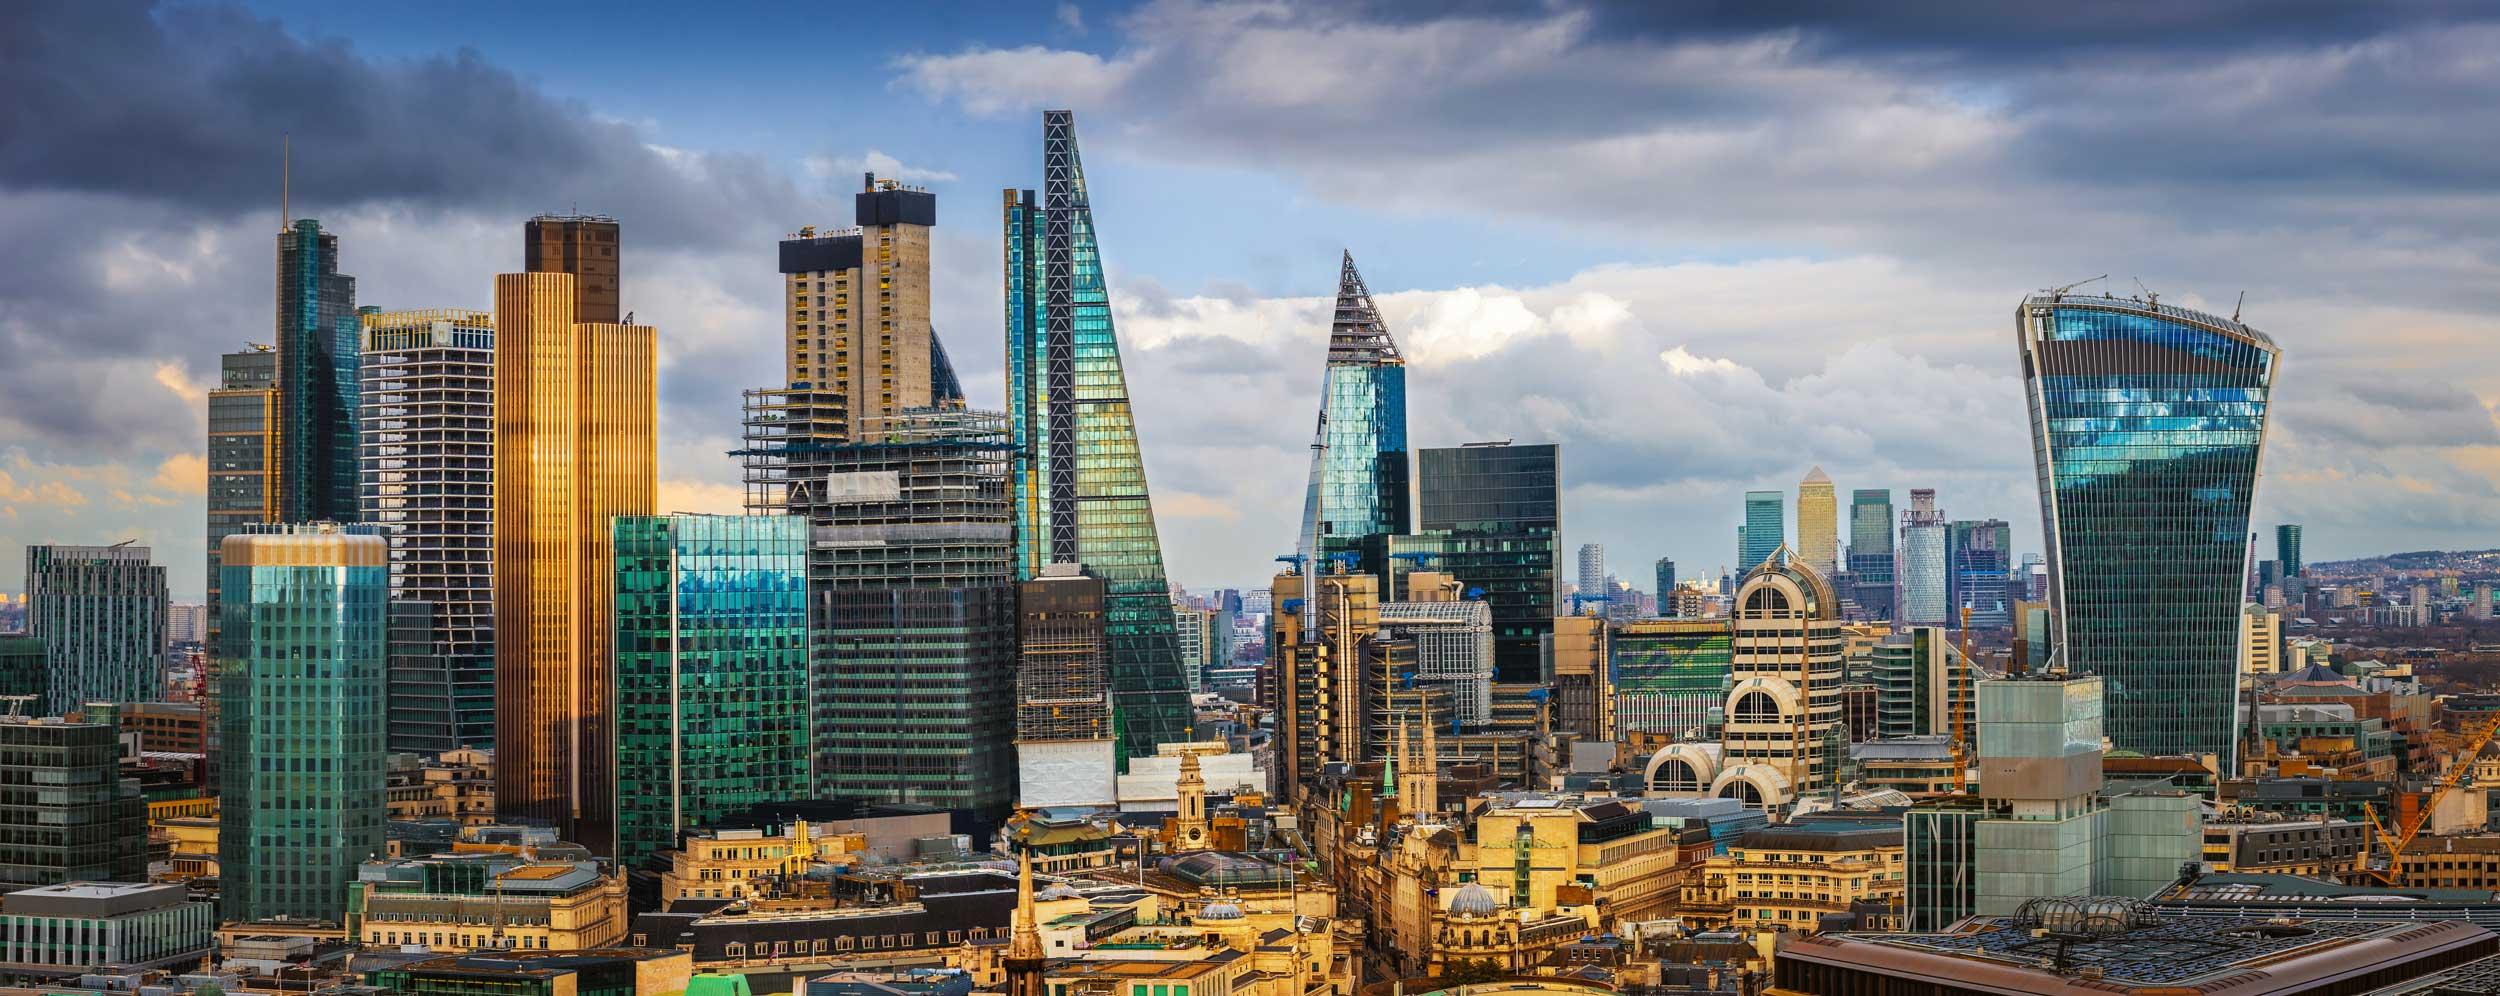 PriestleySoundy London Law Firm